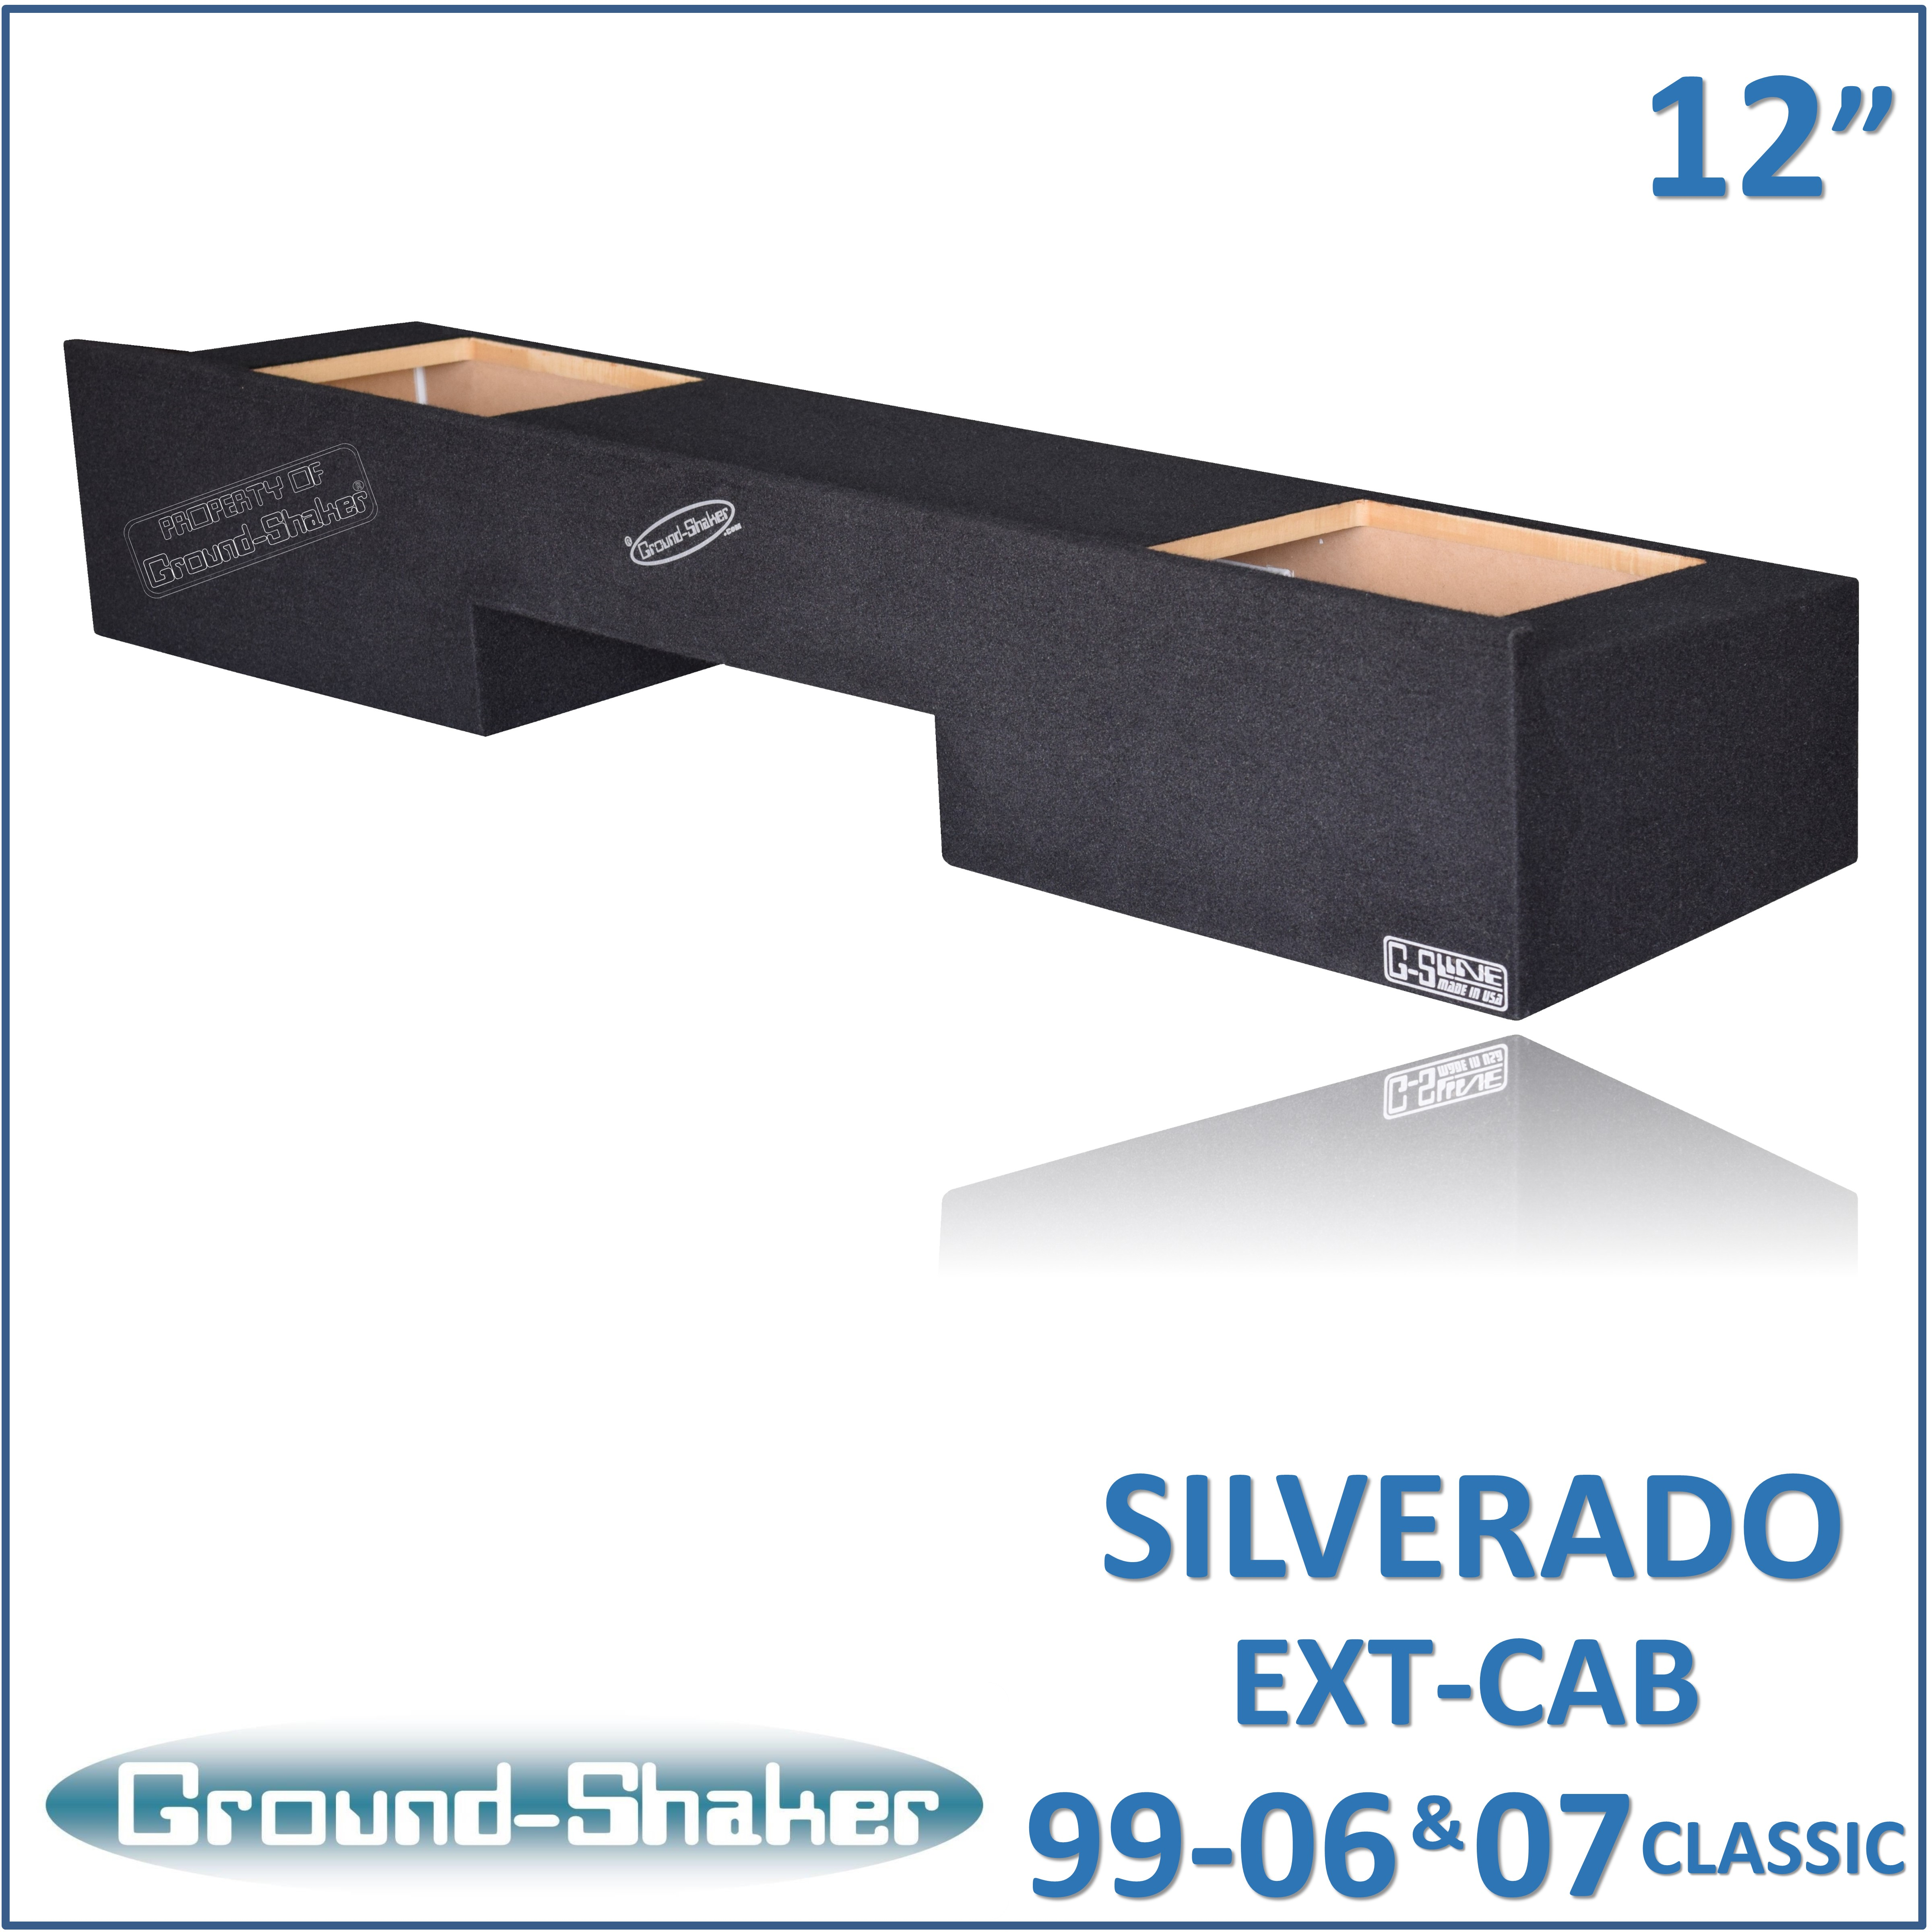 BLACK DUAL SEALED SOLOBARIC SUB BOX FITS CHEVY SILVERADO GMC - Silverado rectangular coffee table